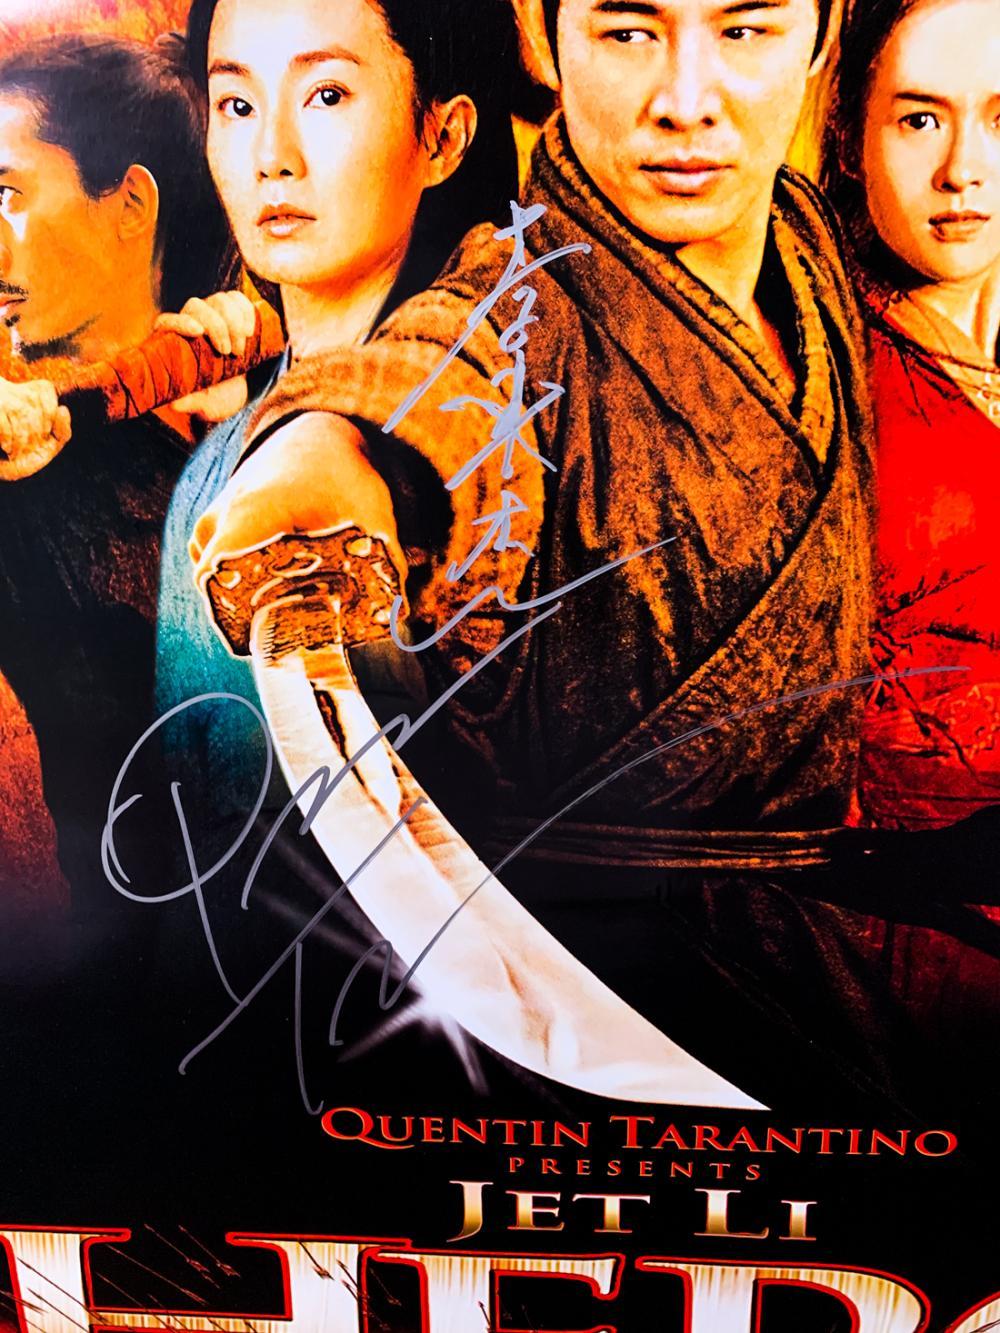 Sold Price Hero 2002 Jet Li Quentin Tarantino Signed Movie Poster September 6 0119 11 00 Am Pdt